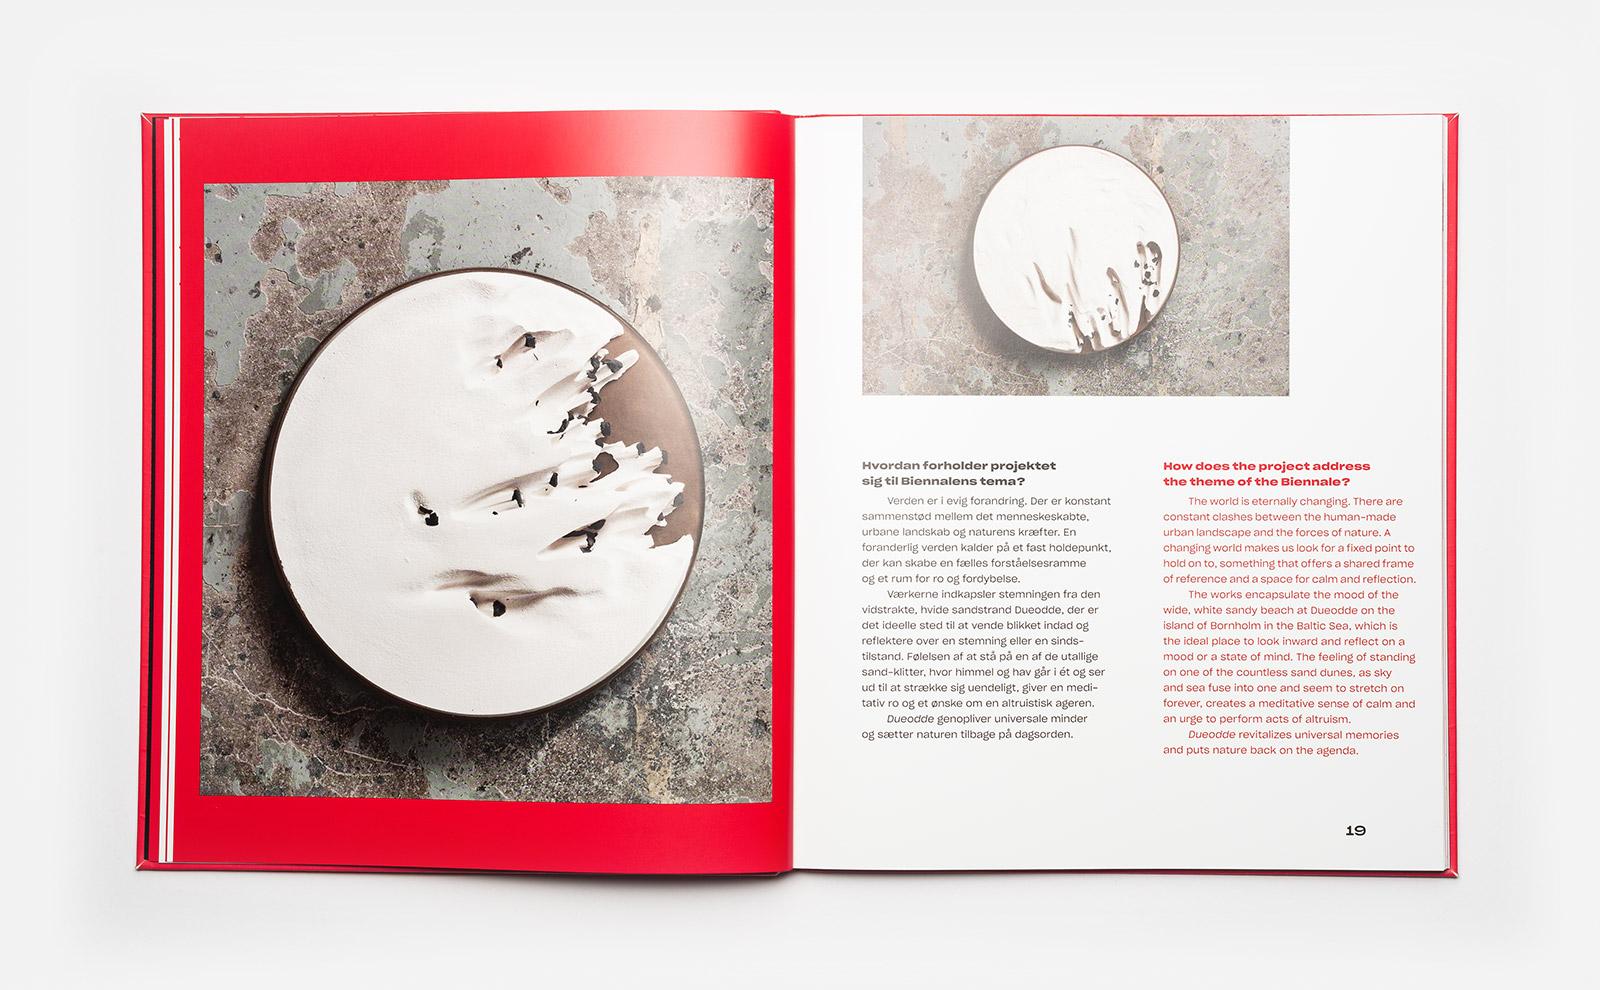 Biennalen_Katalog_04